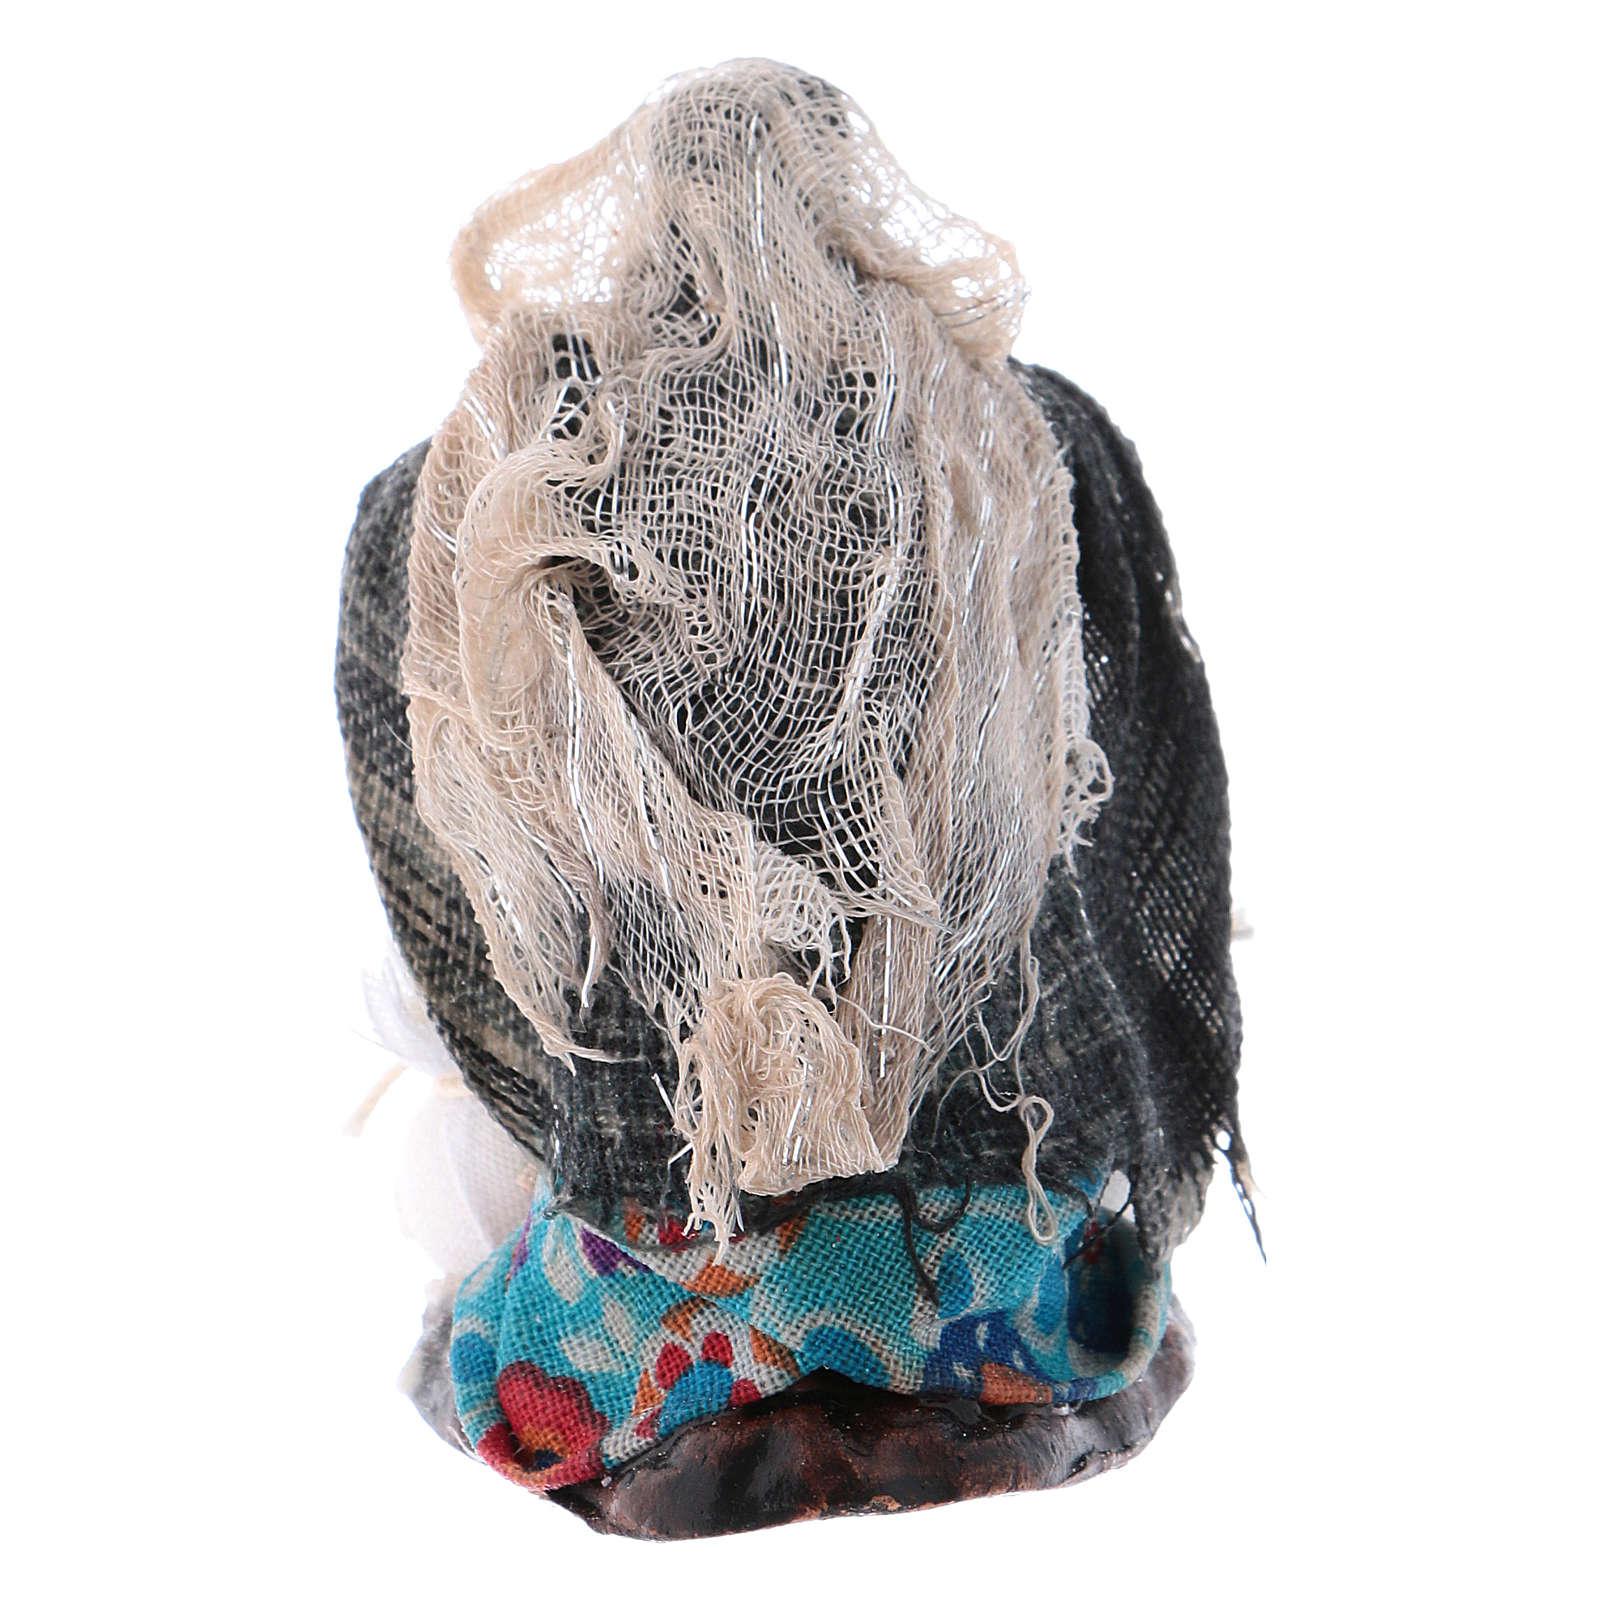 Donna che impasta cm 8 presepe napoletano 4